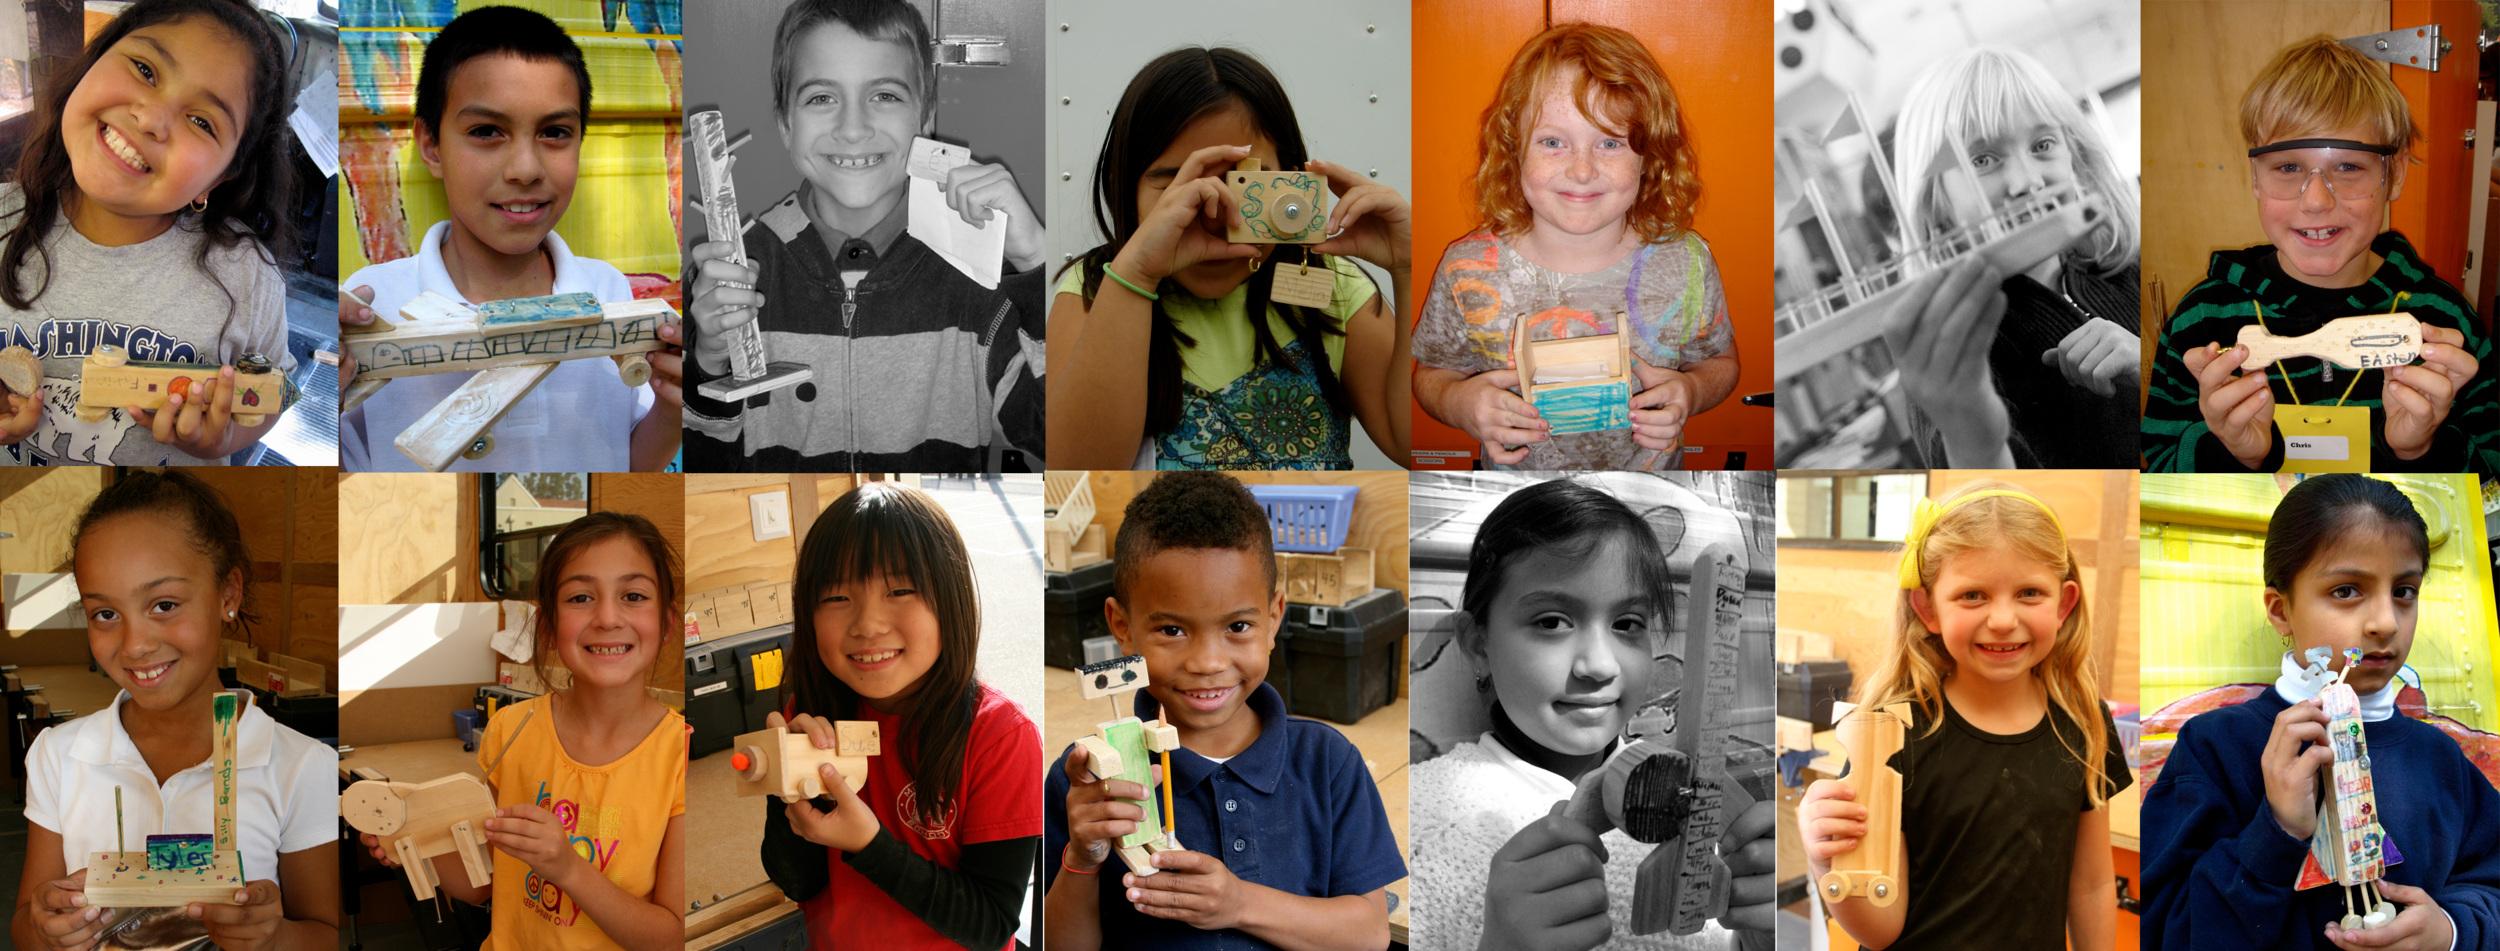 woodworkingbus-kids-collage.jpg